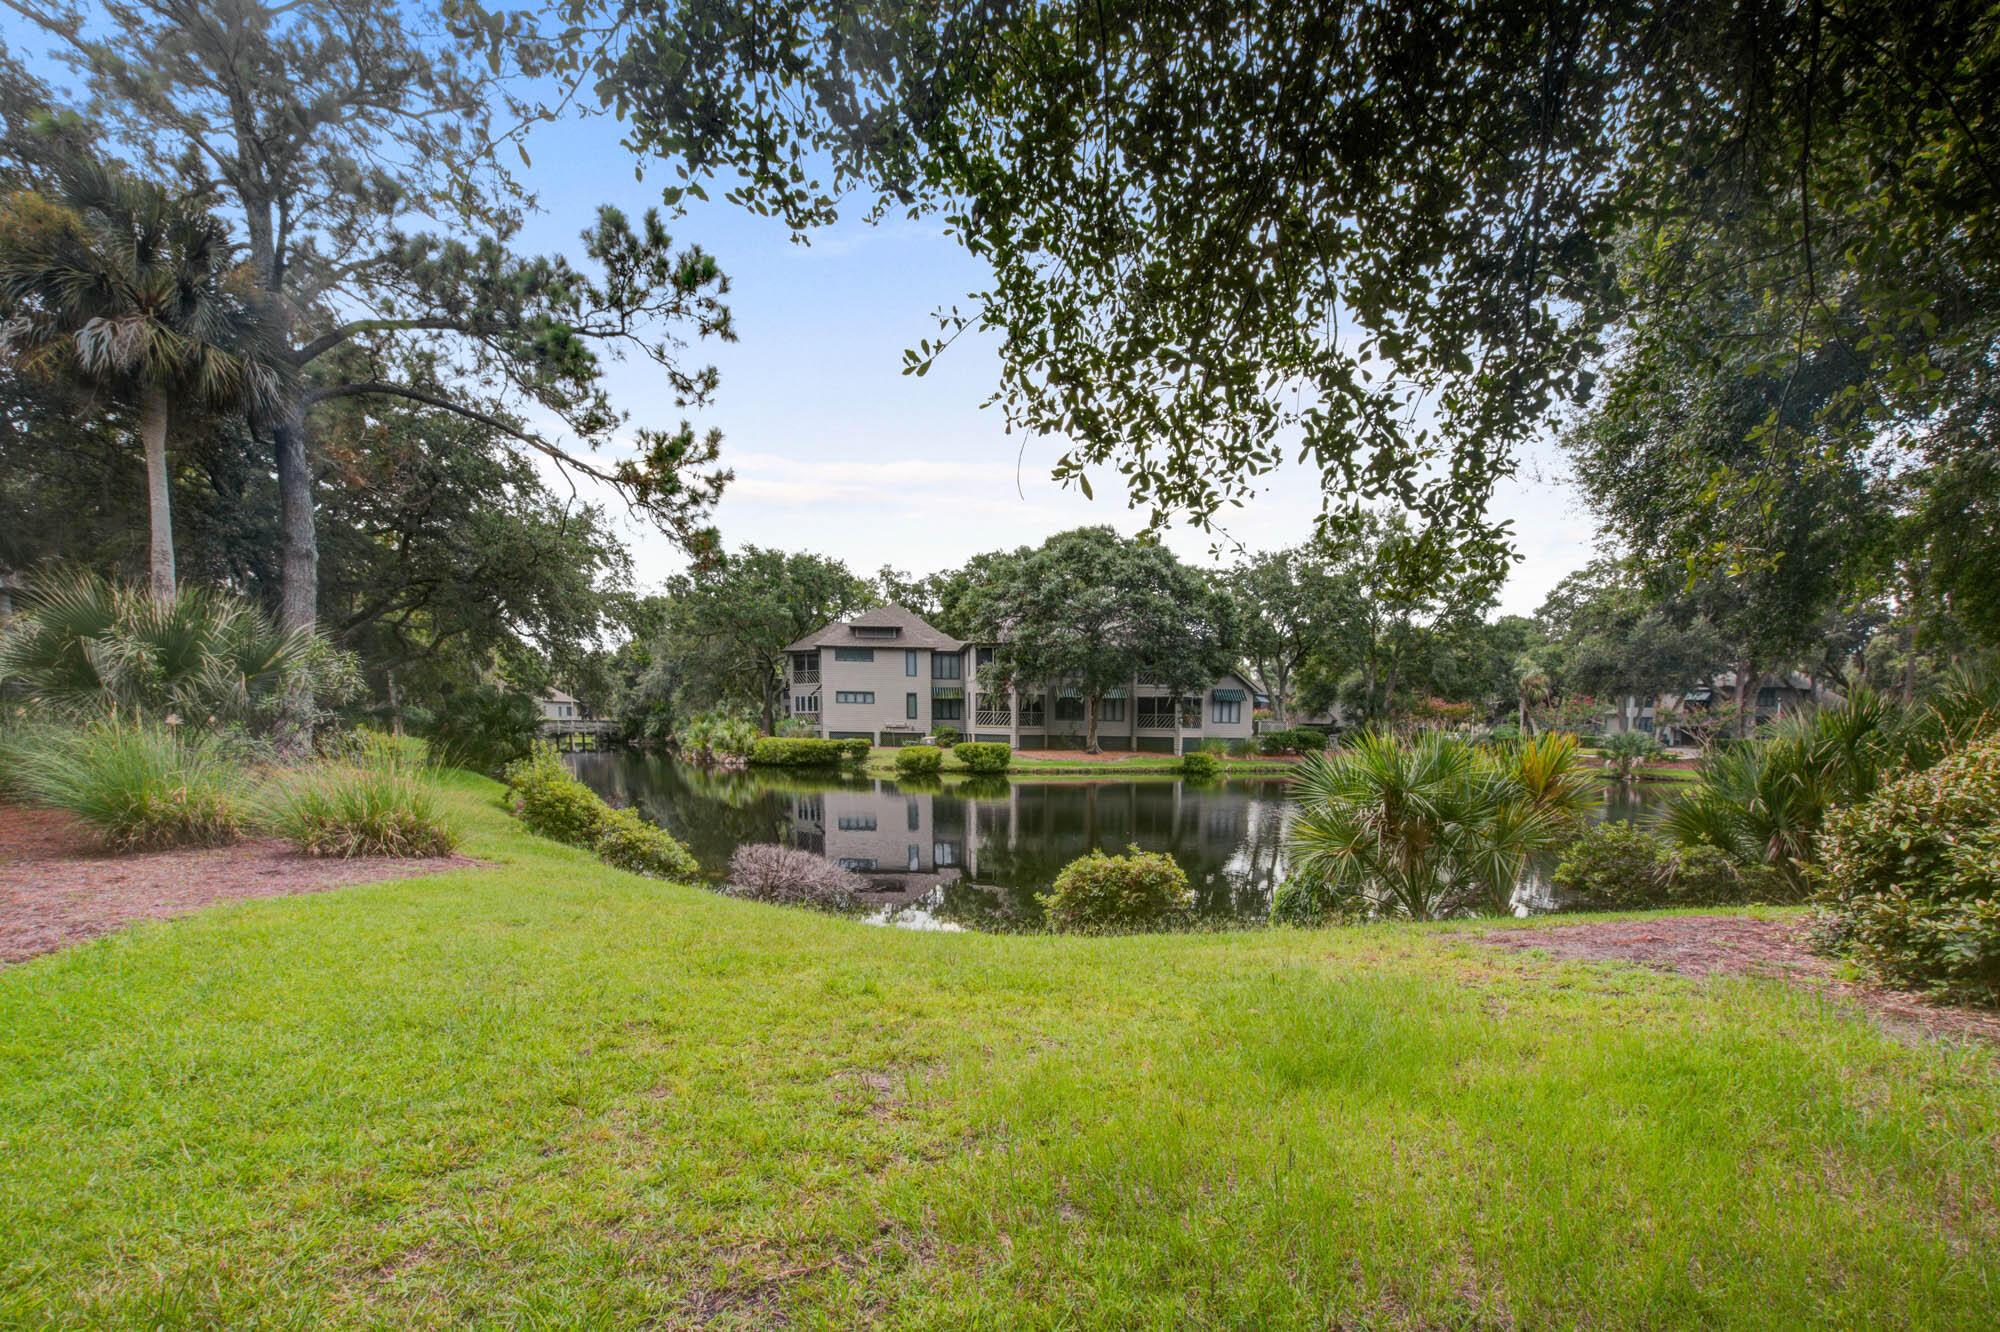 Kiawah Island Homes For Sale - 5513 Green Dolphin Way, Kiawah Island, SC - 2